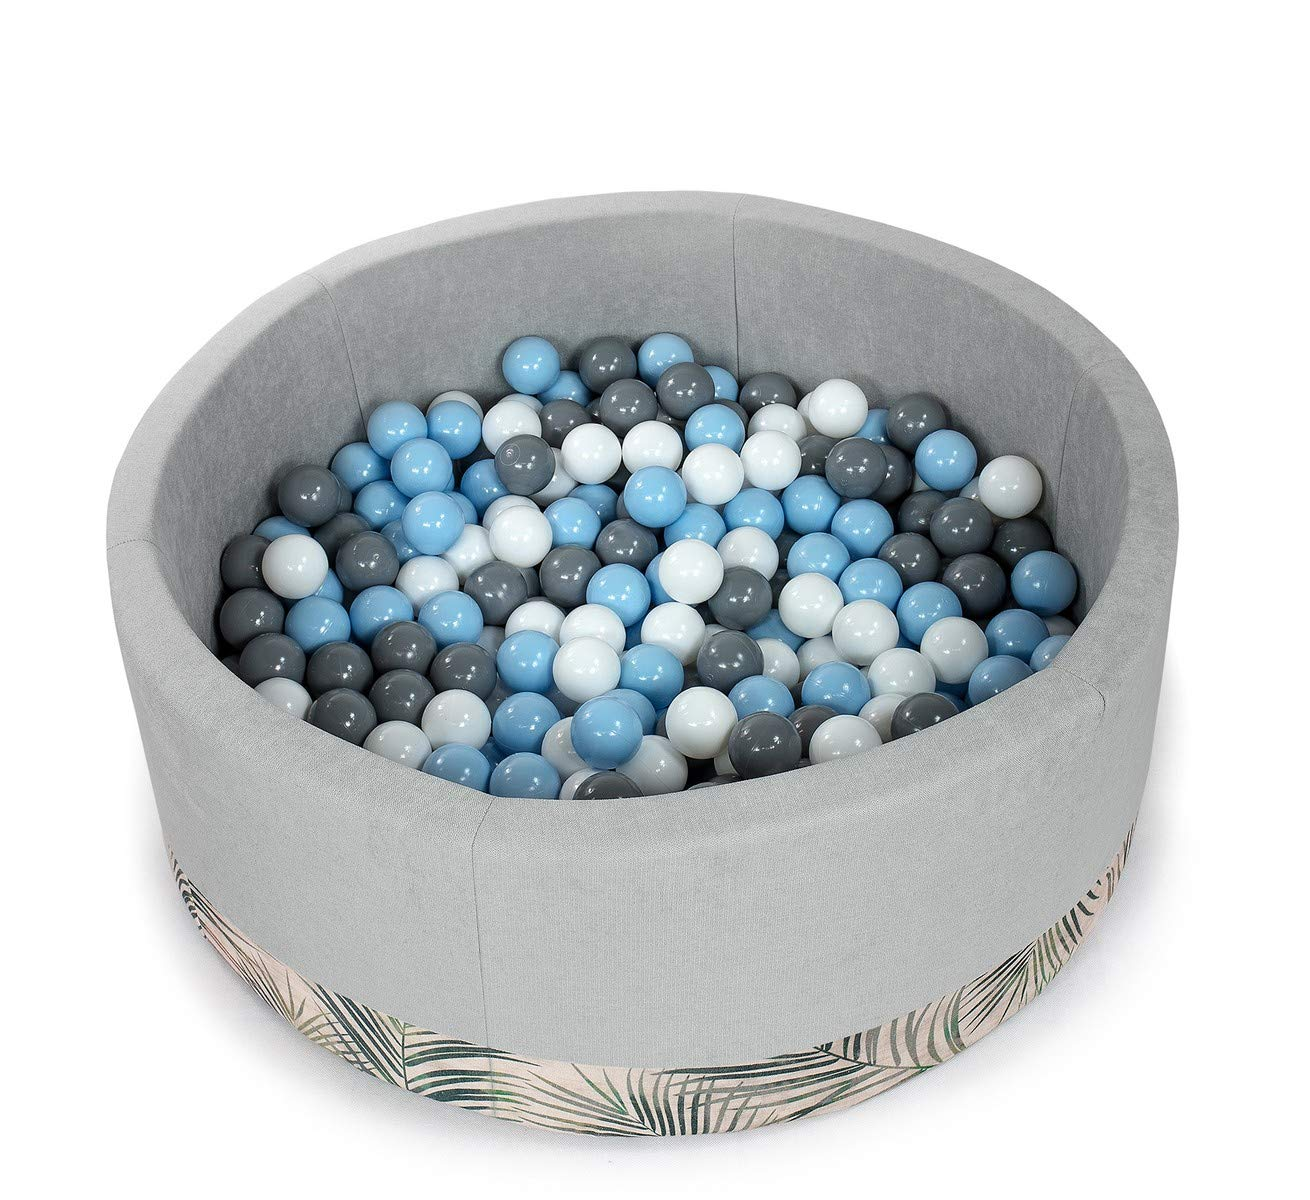 Tweepsy Soft Baby Kids Play Round Ball Pool Pit 250 Balls 90x30cm Handmade EU -BKODP5N - palm-light grey pool: baby pink, white, grey Kids Ball Pool Pit